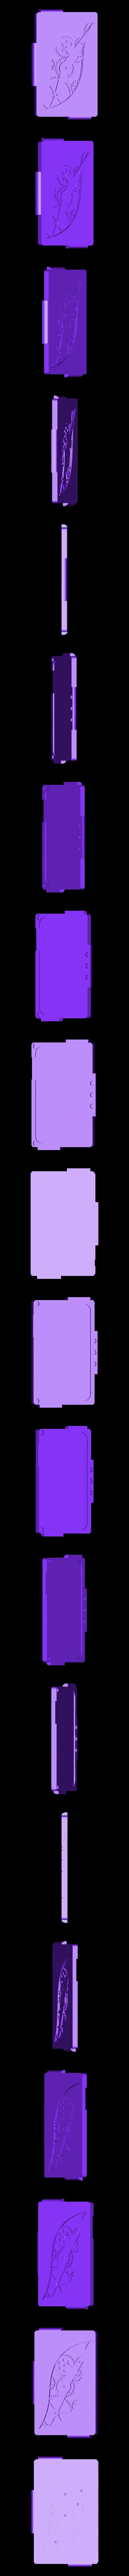 back_Gears_V2.stl Download free STL file Pulse BF Doors - Gears • 3D printing design, shawnrchq